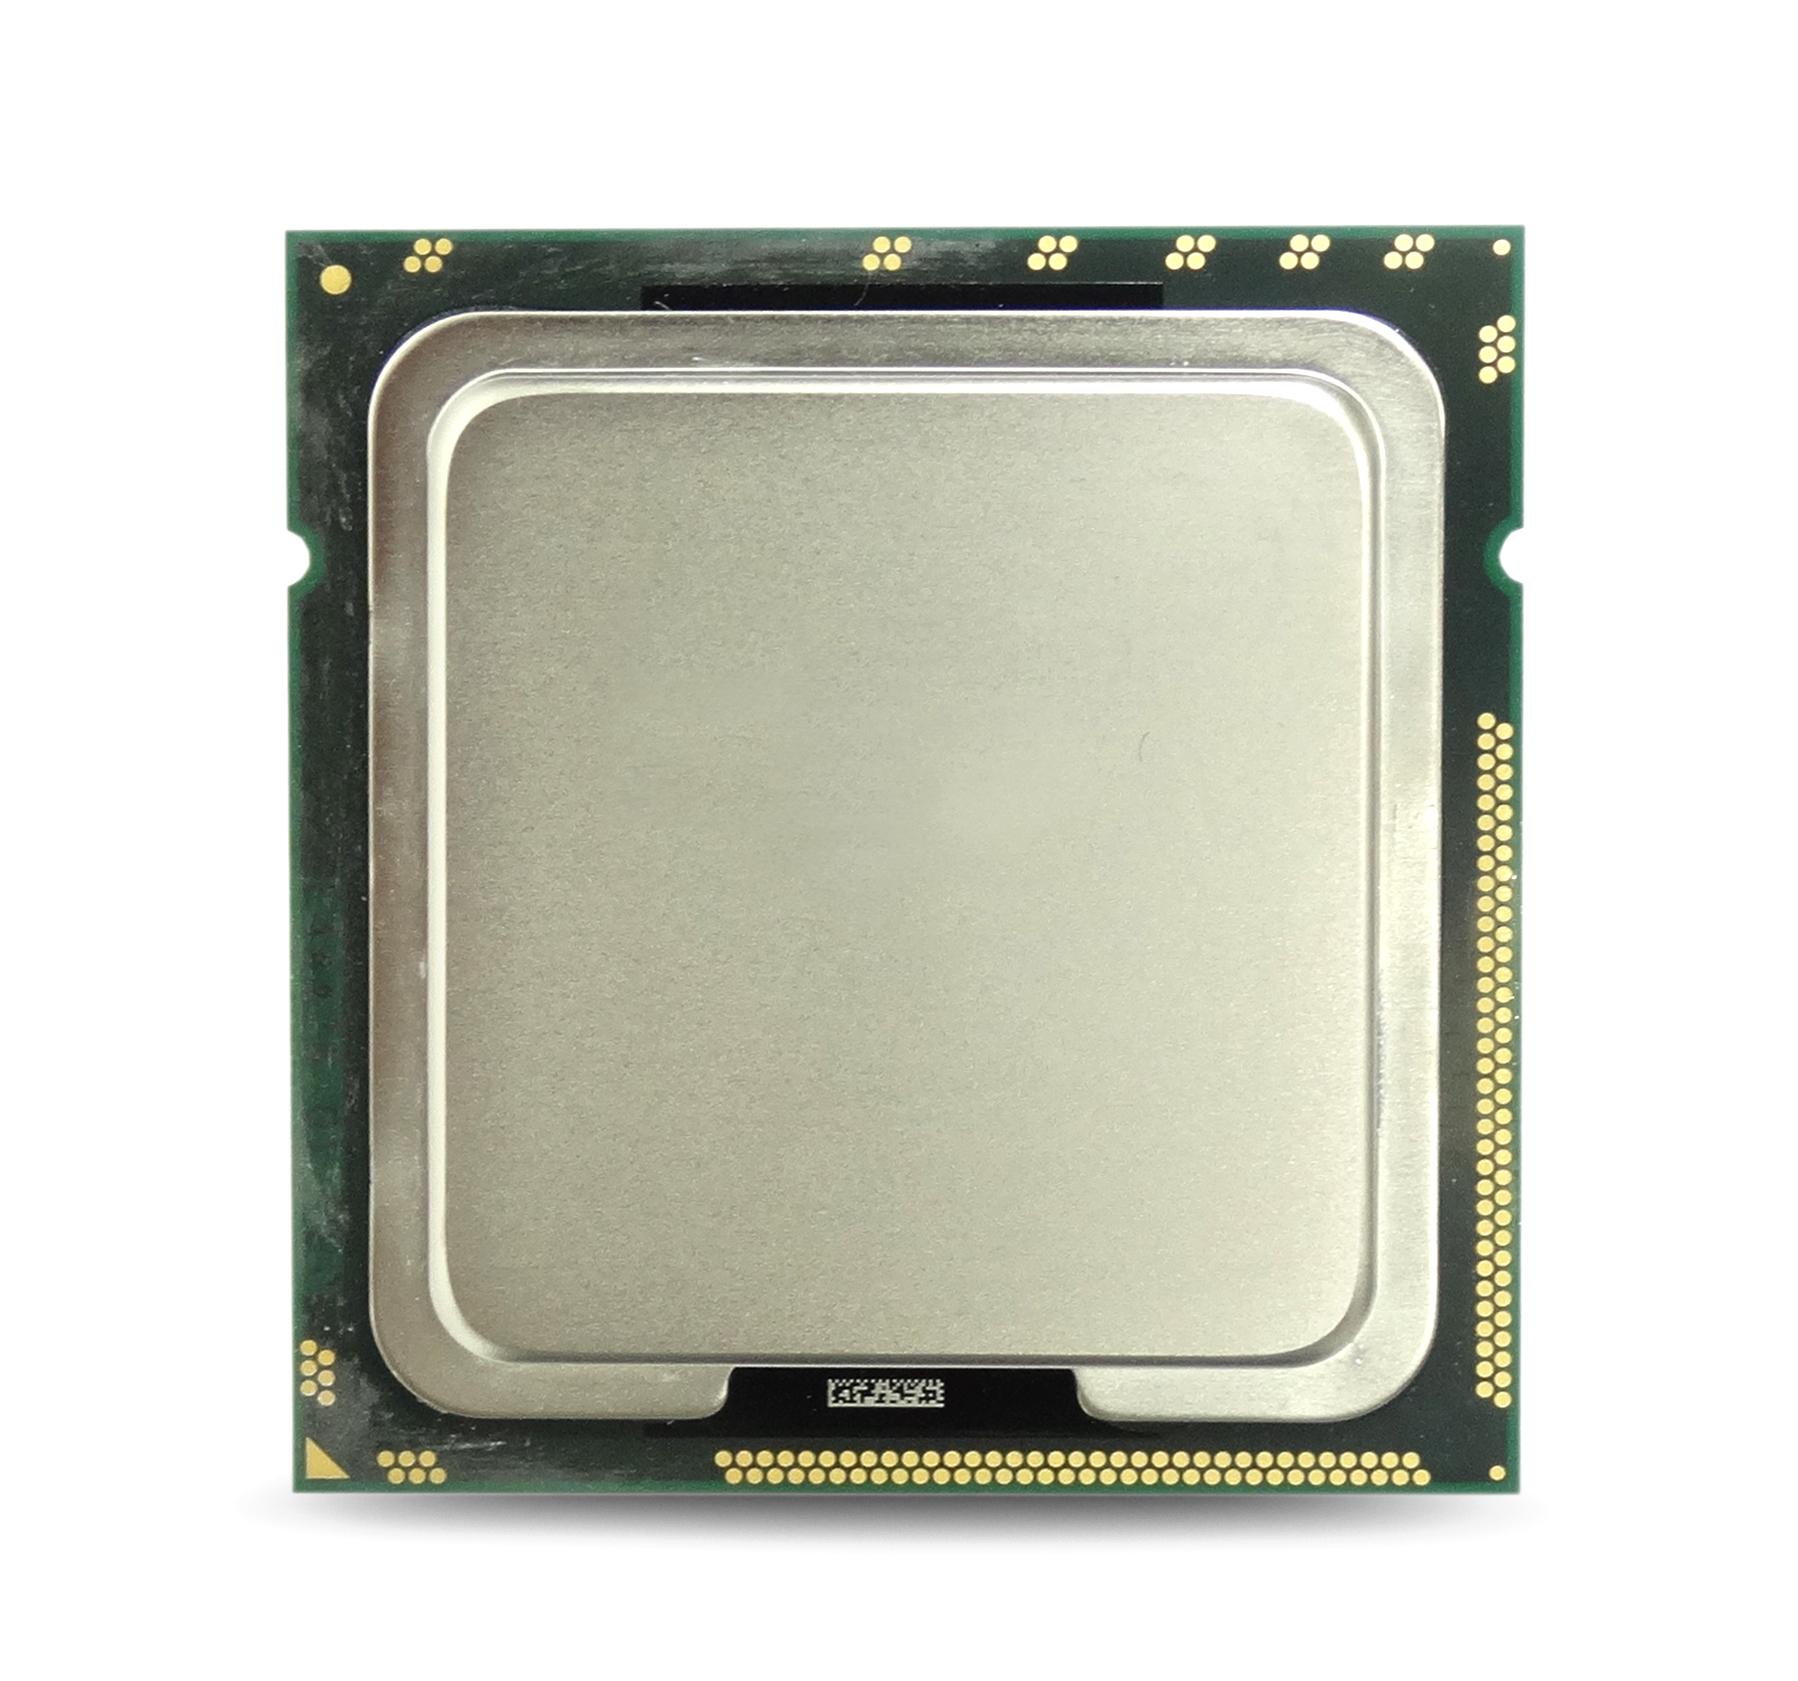 SLBRG Intel Xeon E7540 2.0GHz 6 Core 18MB Cache LGA1567 Processor (SLBRG)